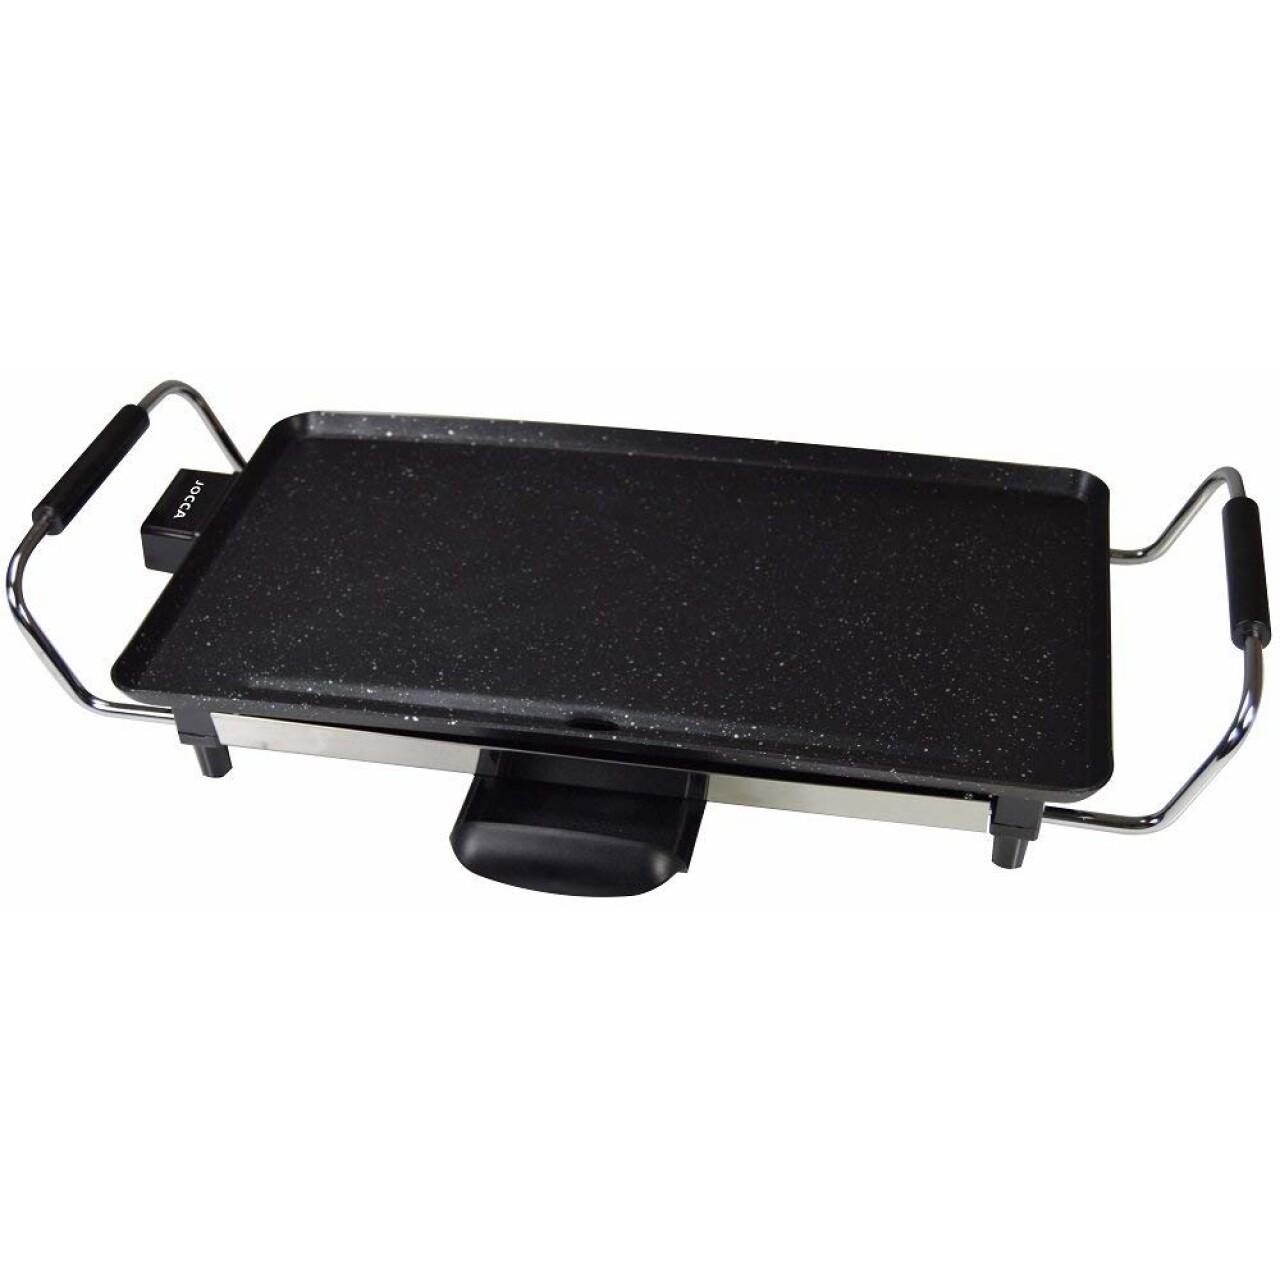 Gratar electric Jocca, 2000W, 43 x 23 cm, negru